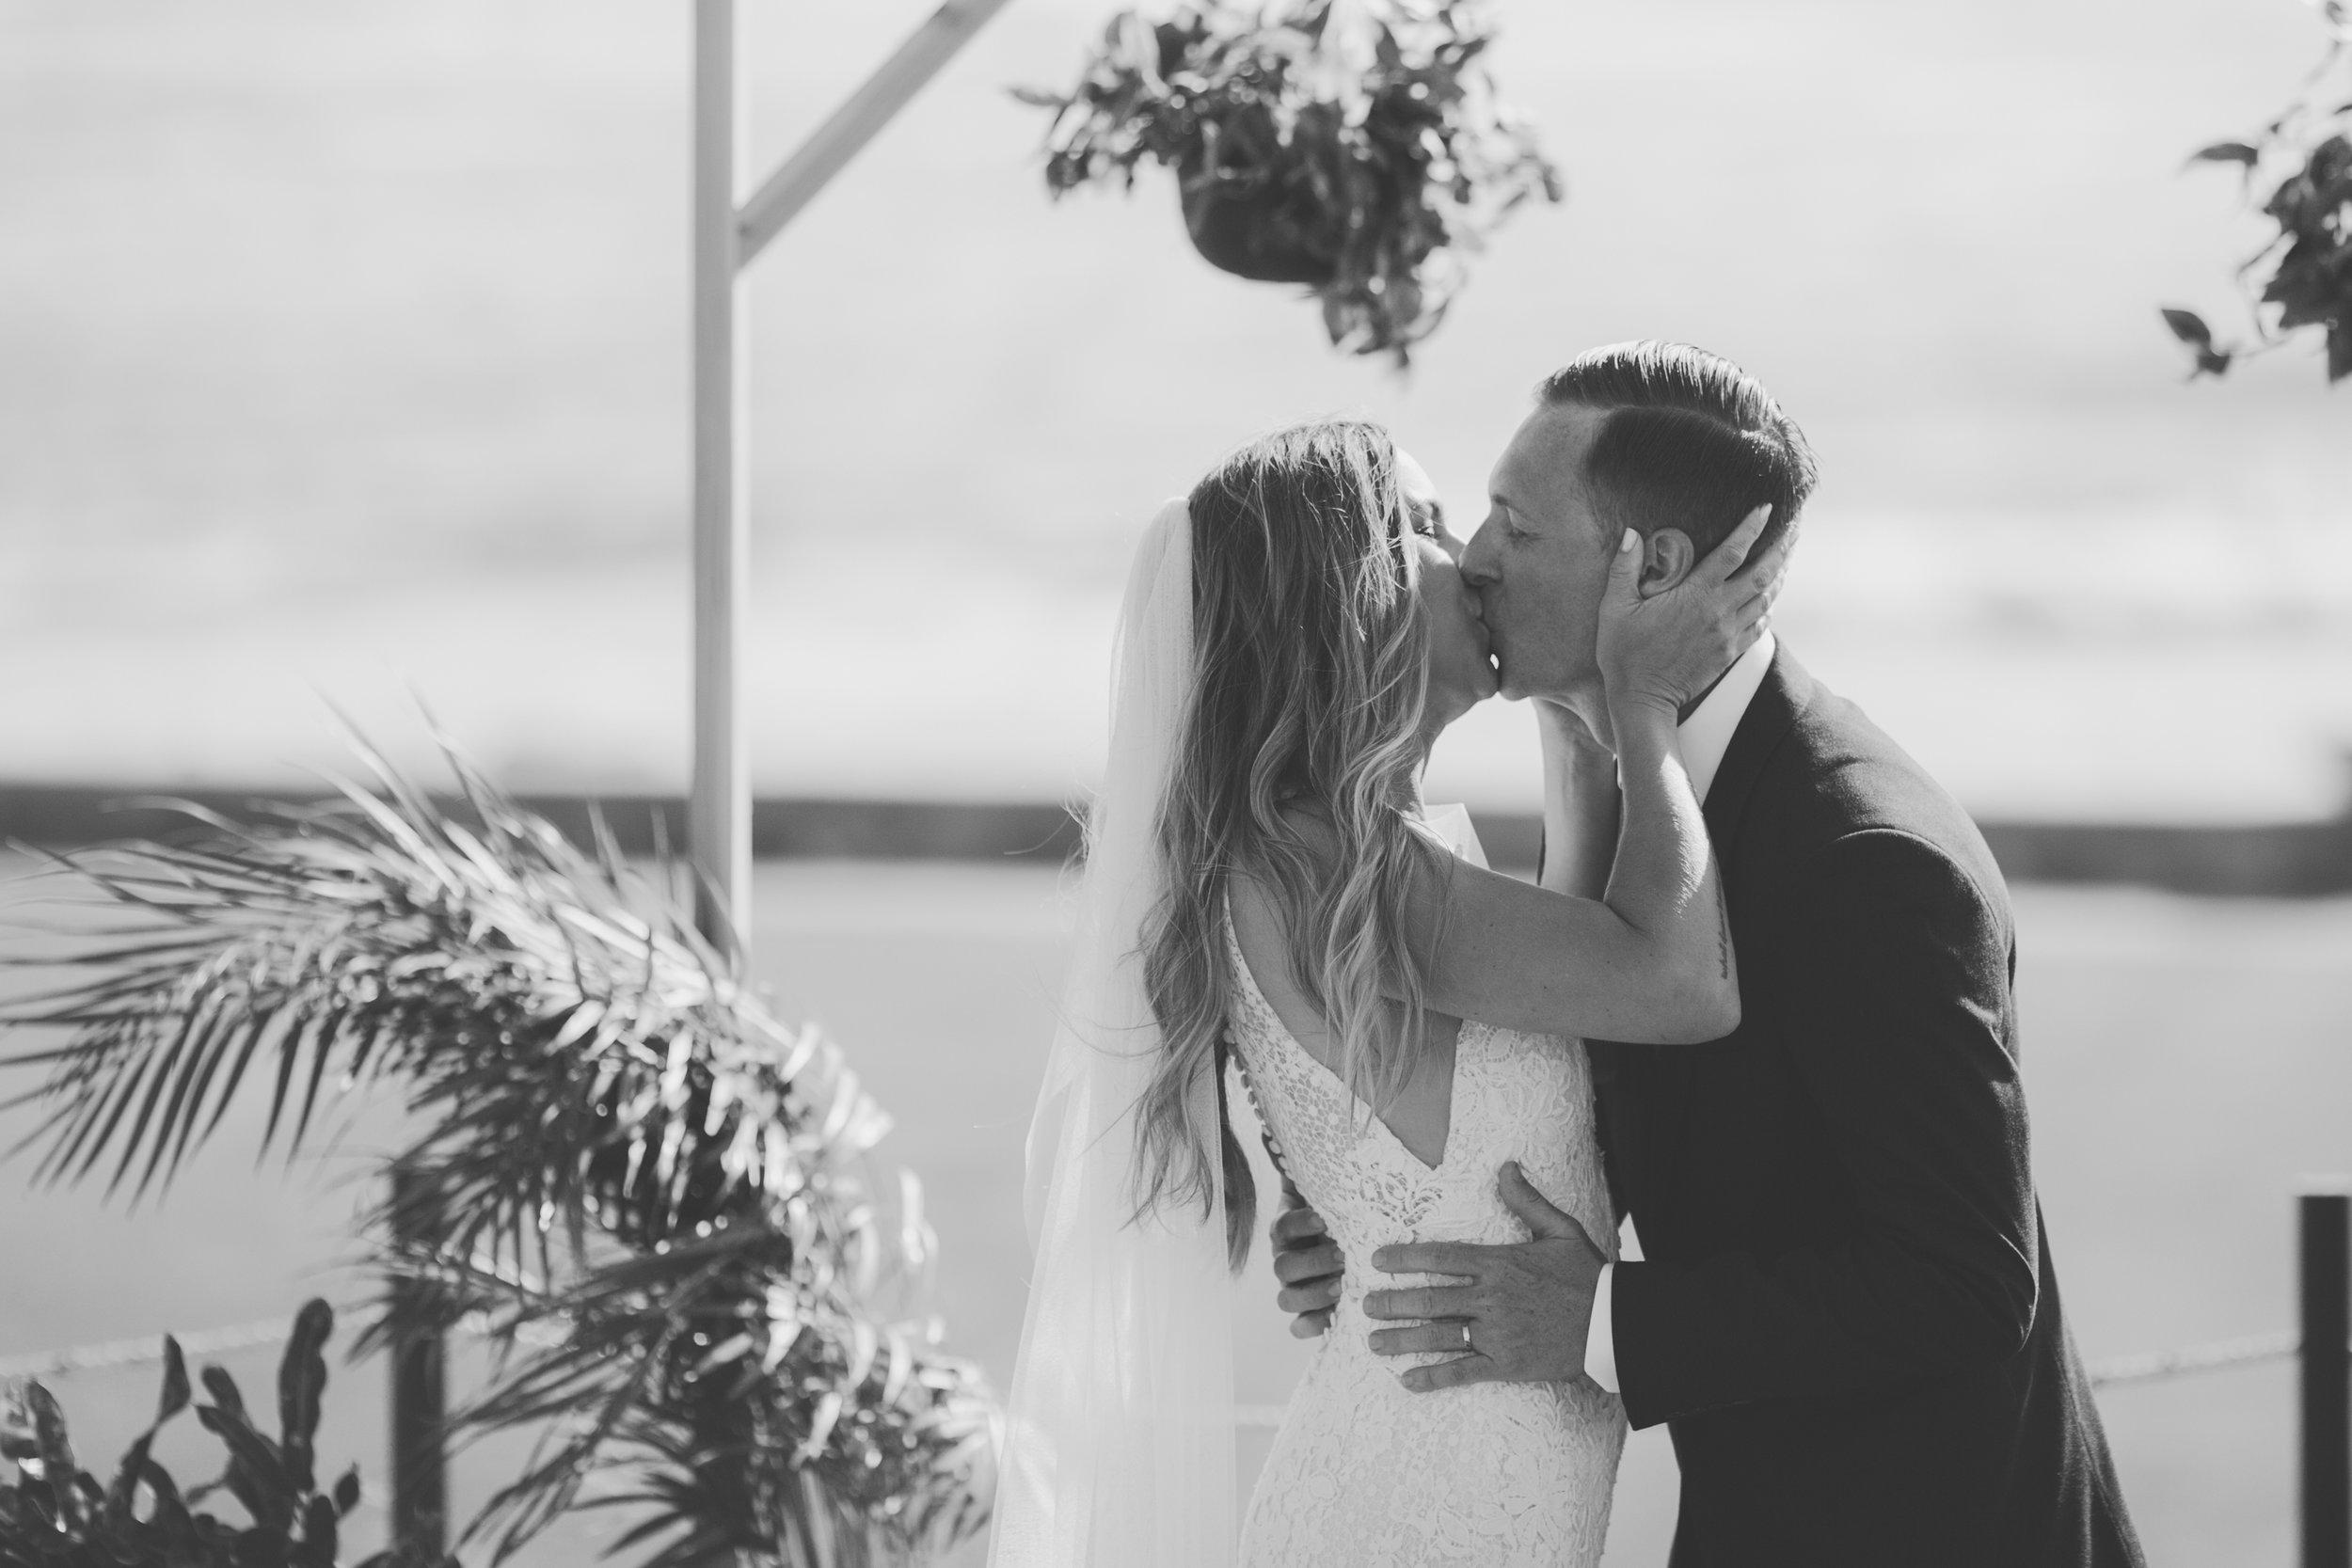 amandavanvels_ensenada_mexico_wedding_047.jpg